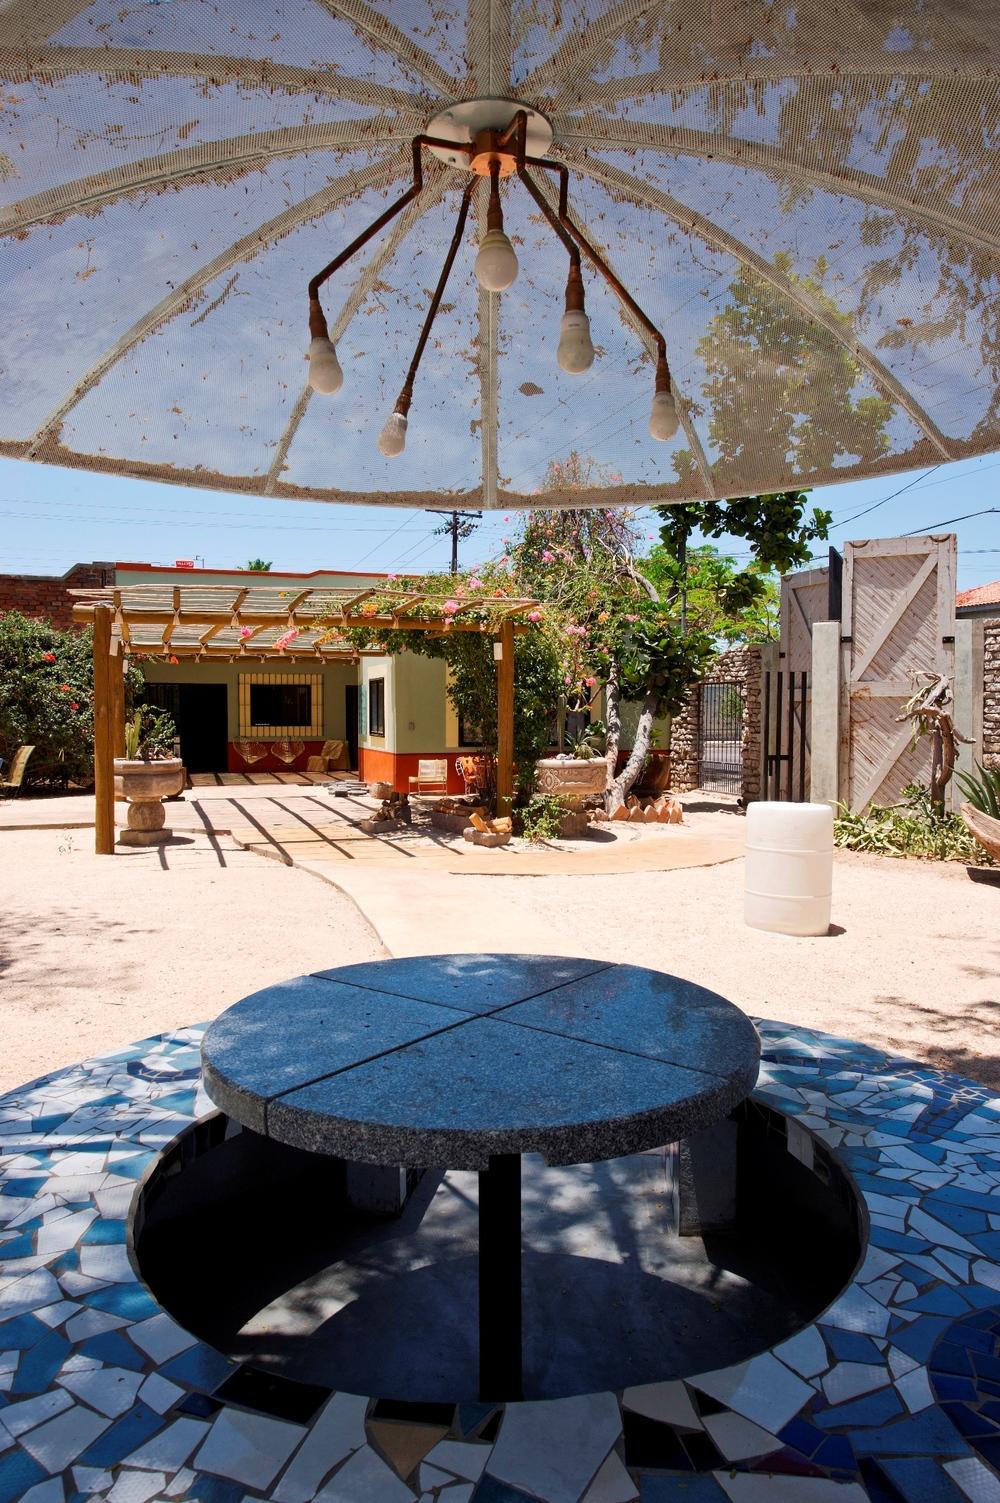 mesa-ecologica-azulejo-sombrilla-parabolica-oficina-tenaja-holdings-la-paz.jpg